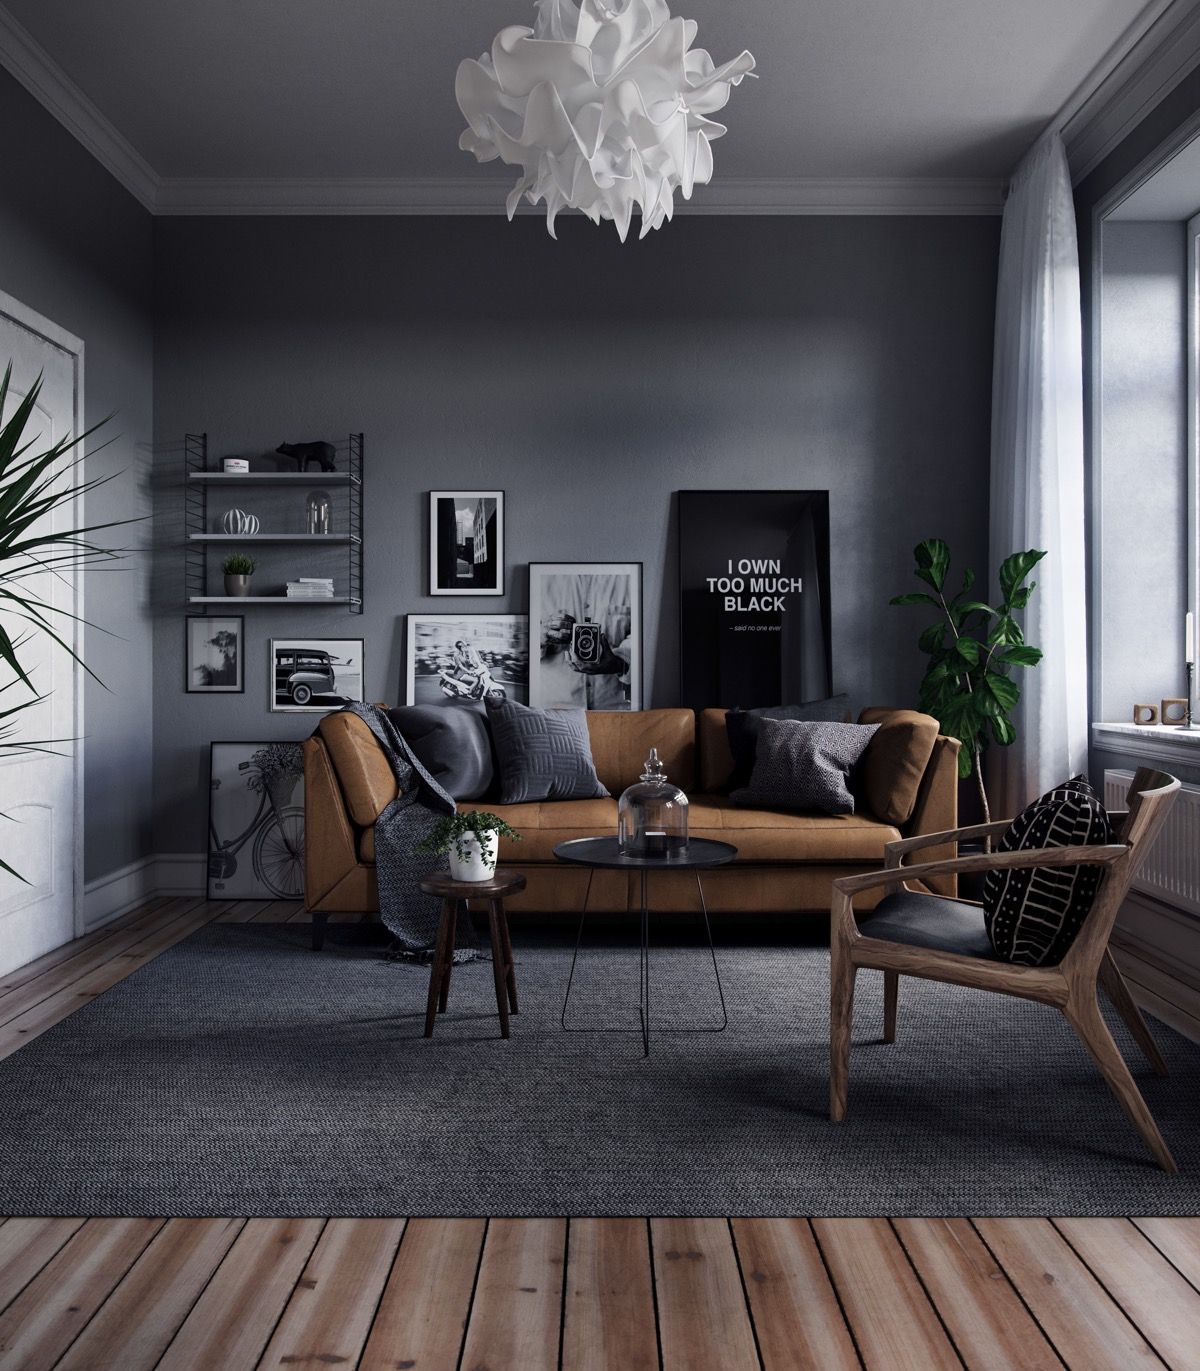 dark-scandinavian-decor